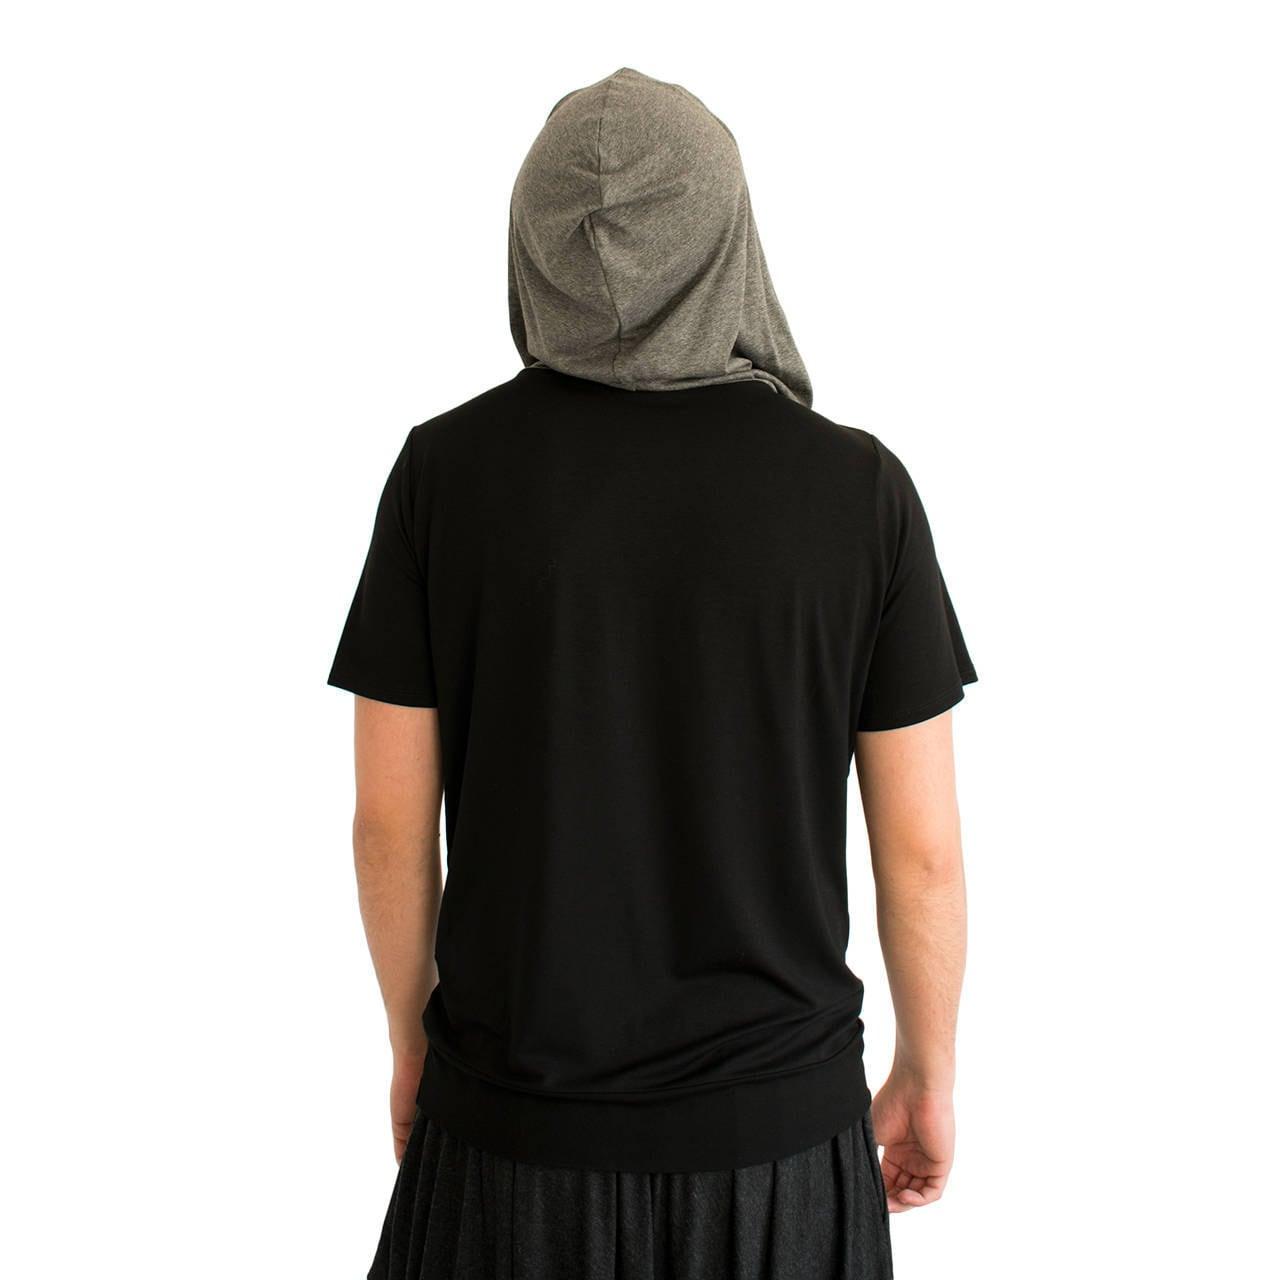 grau mit kapuze oben kapuzen t shirt herren t shirt. Black Bedroom Furniture Sets. Home Design Ideas